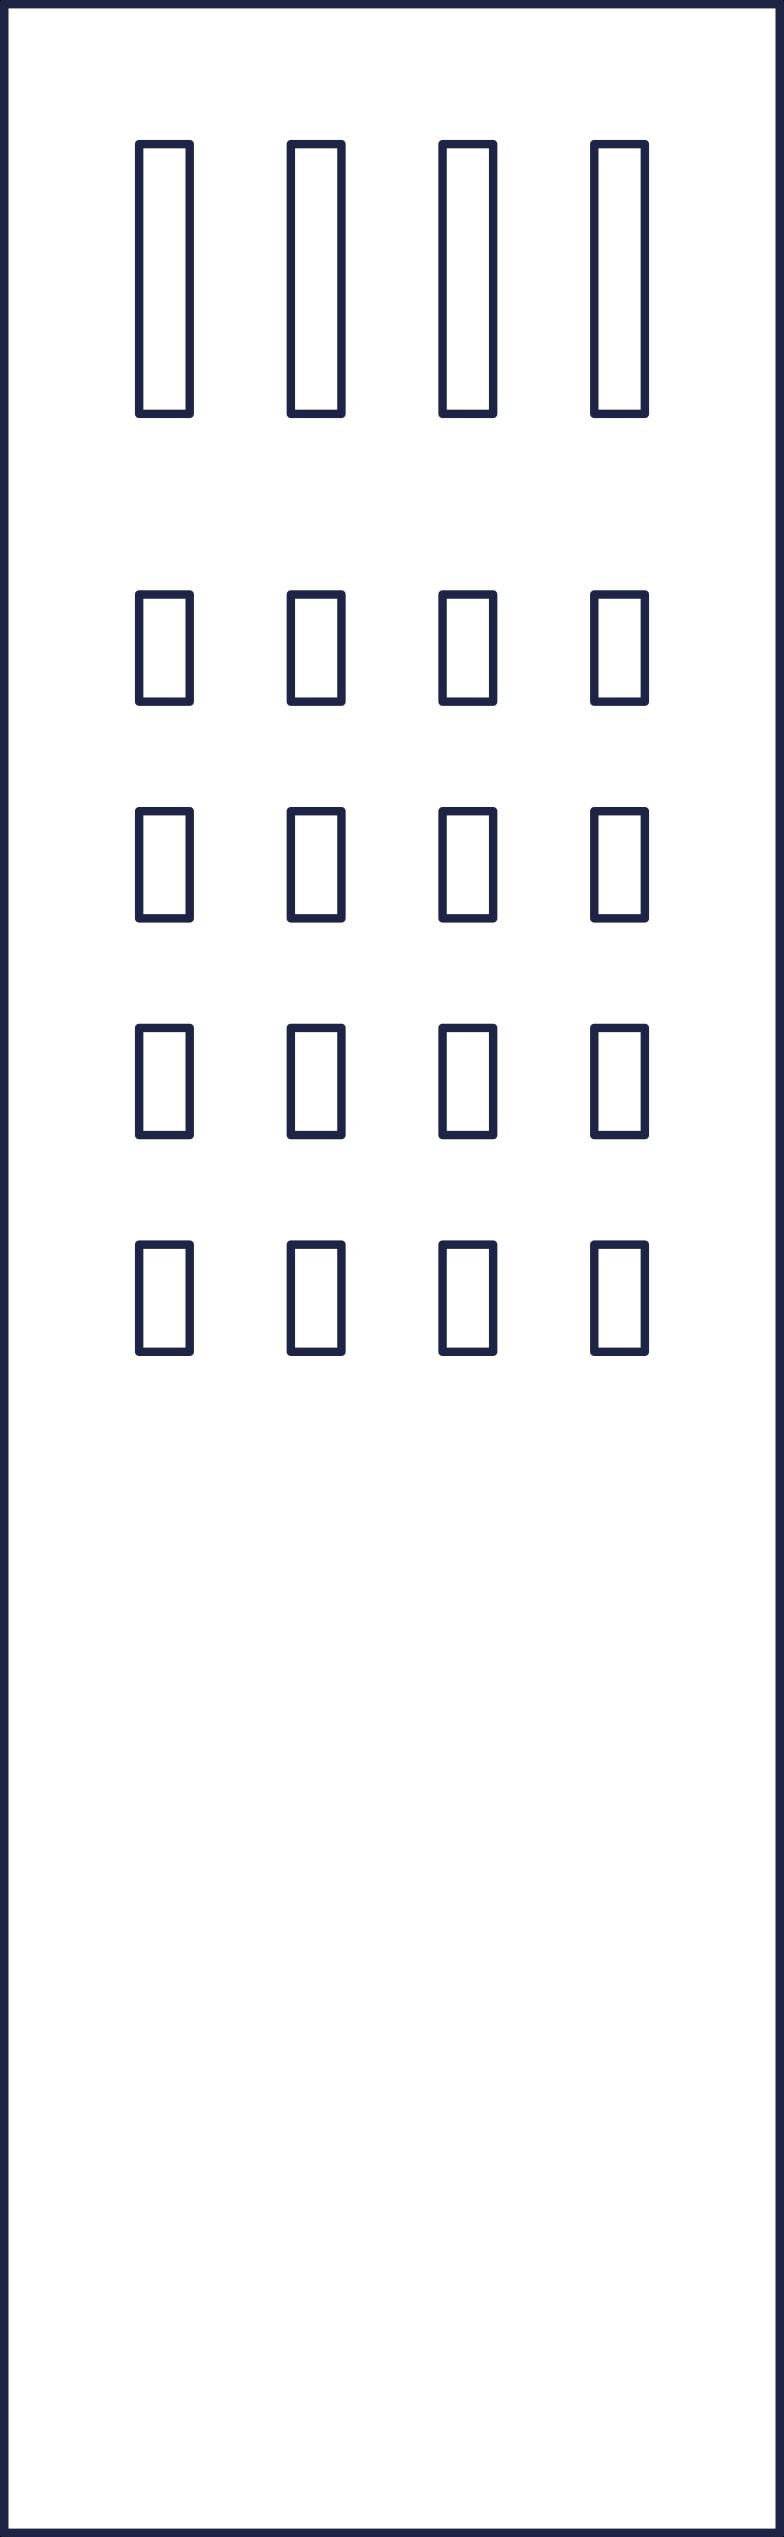 skyscraper Clipart illustration in PNG, SVG